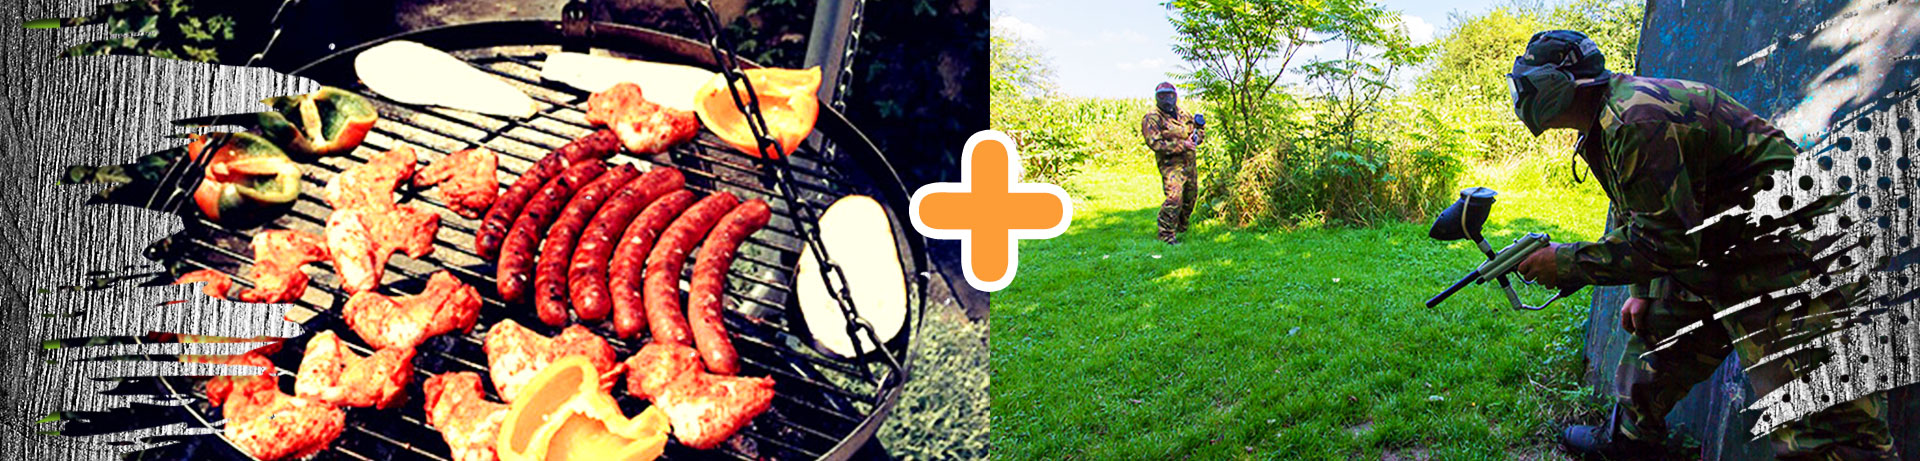 Paintball-arrangement_inclusief-barbecue